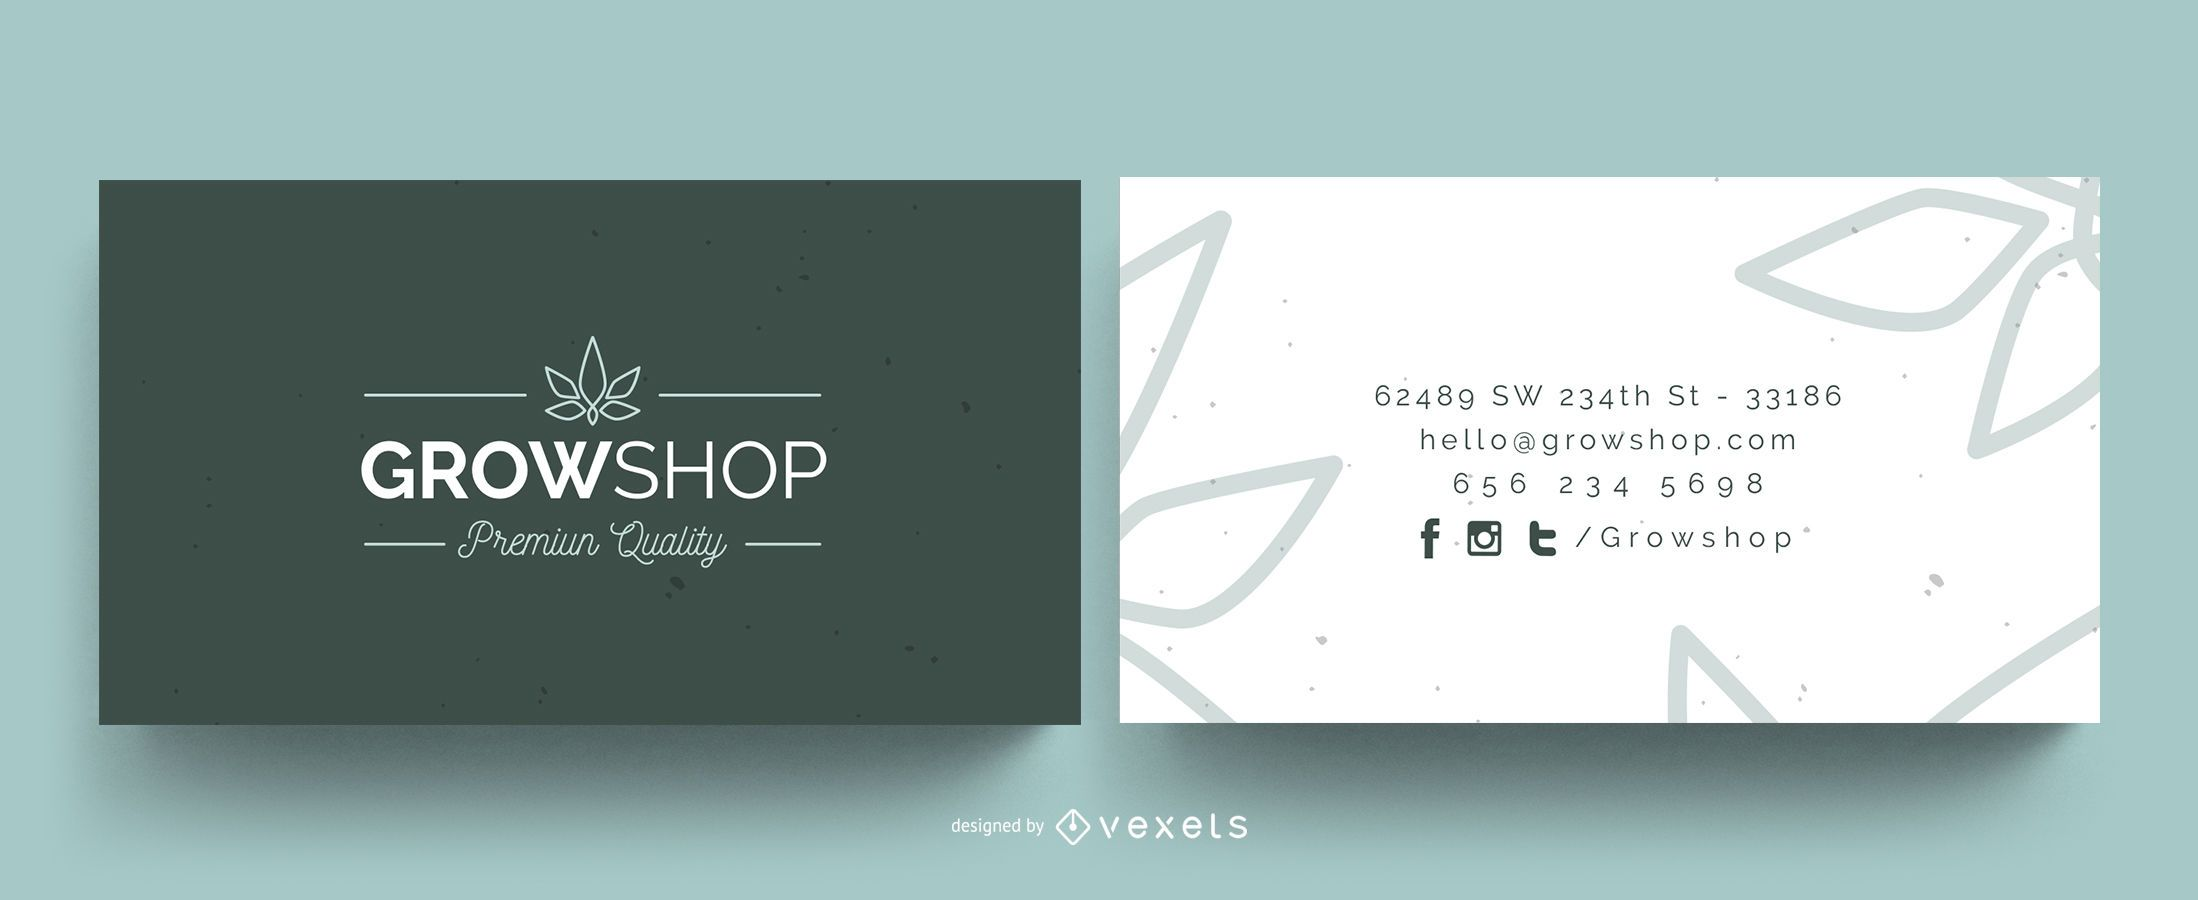 Grow shop business card